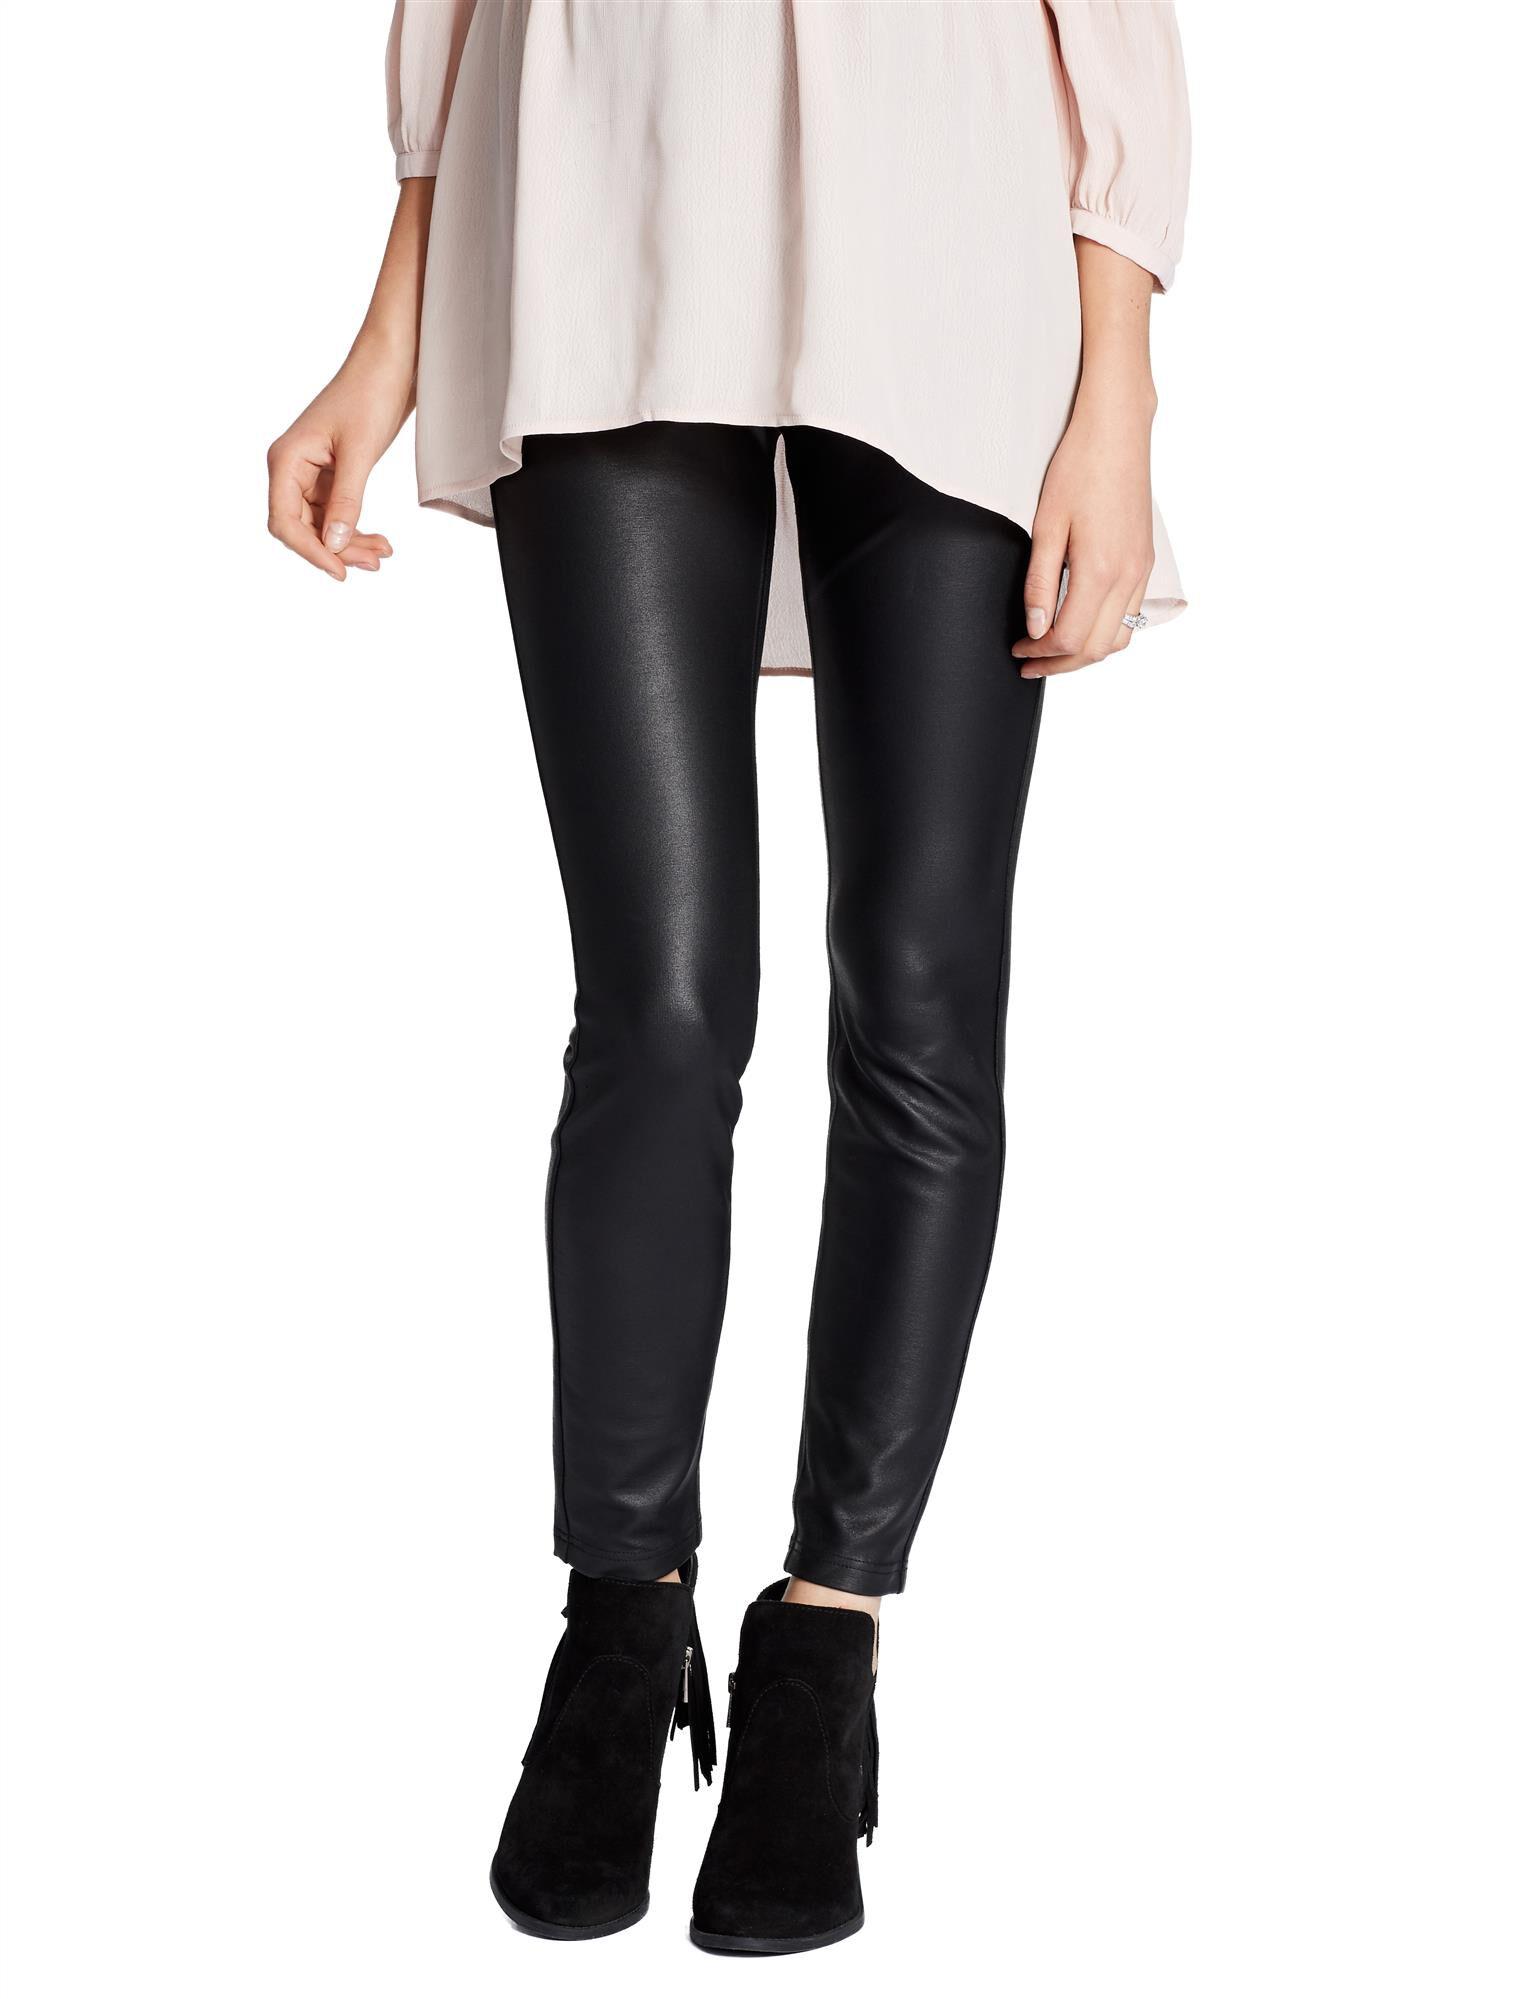 Jessica Simpson Secret Fit Belly Faux Leather Maternity Leggings